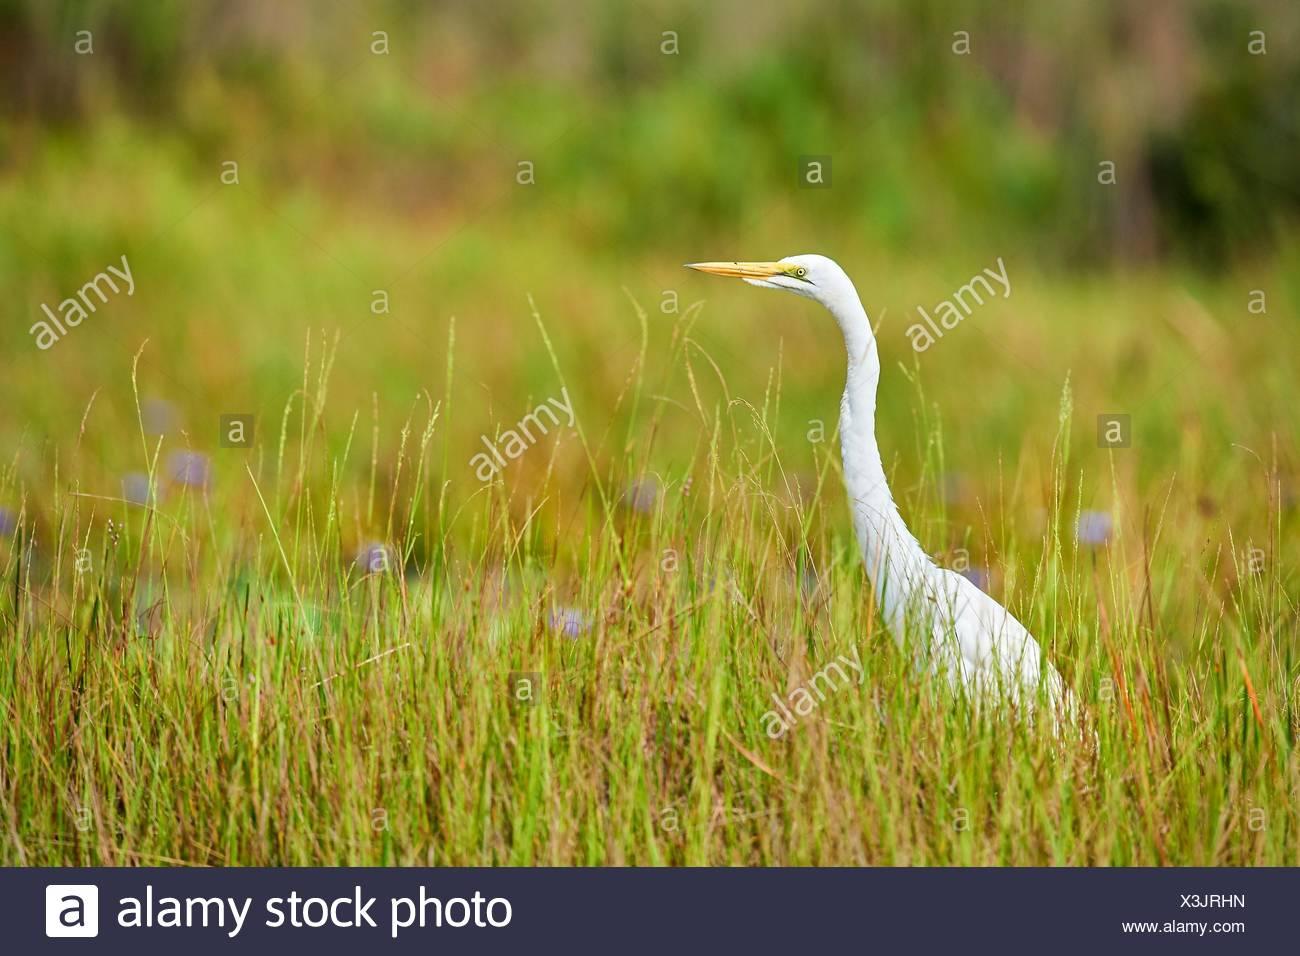 Great egret (Ardea alba) in the swamps of Mabamba, lake Victoria, Uganda. - Stock Image